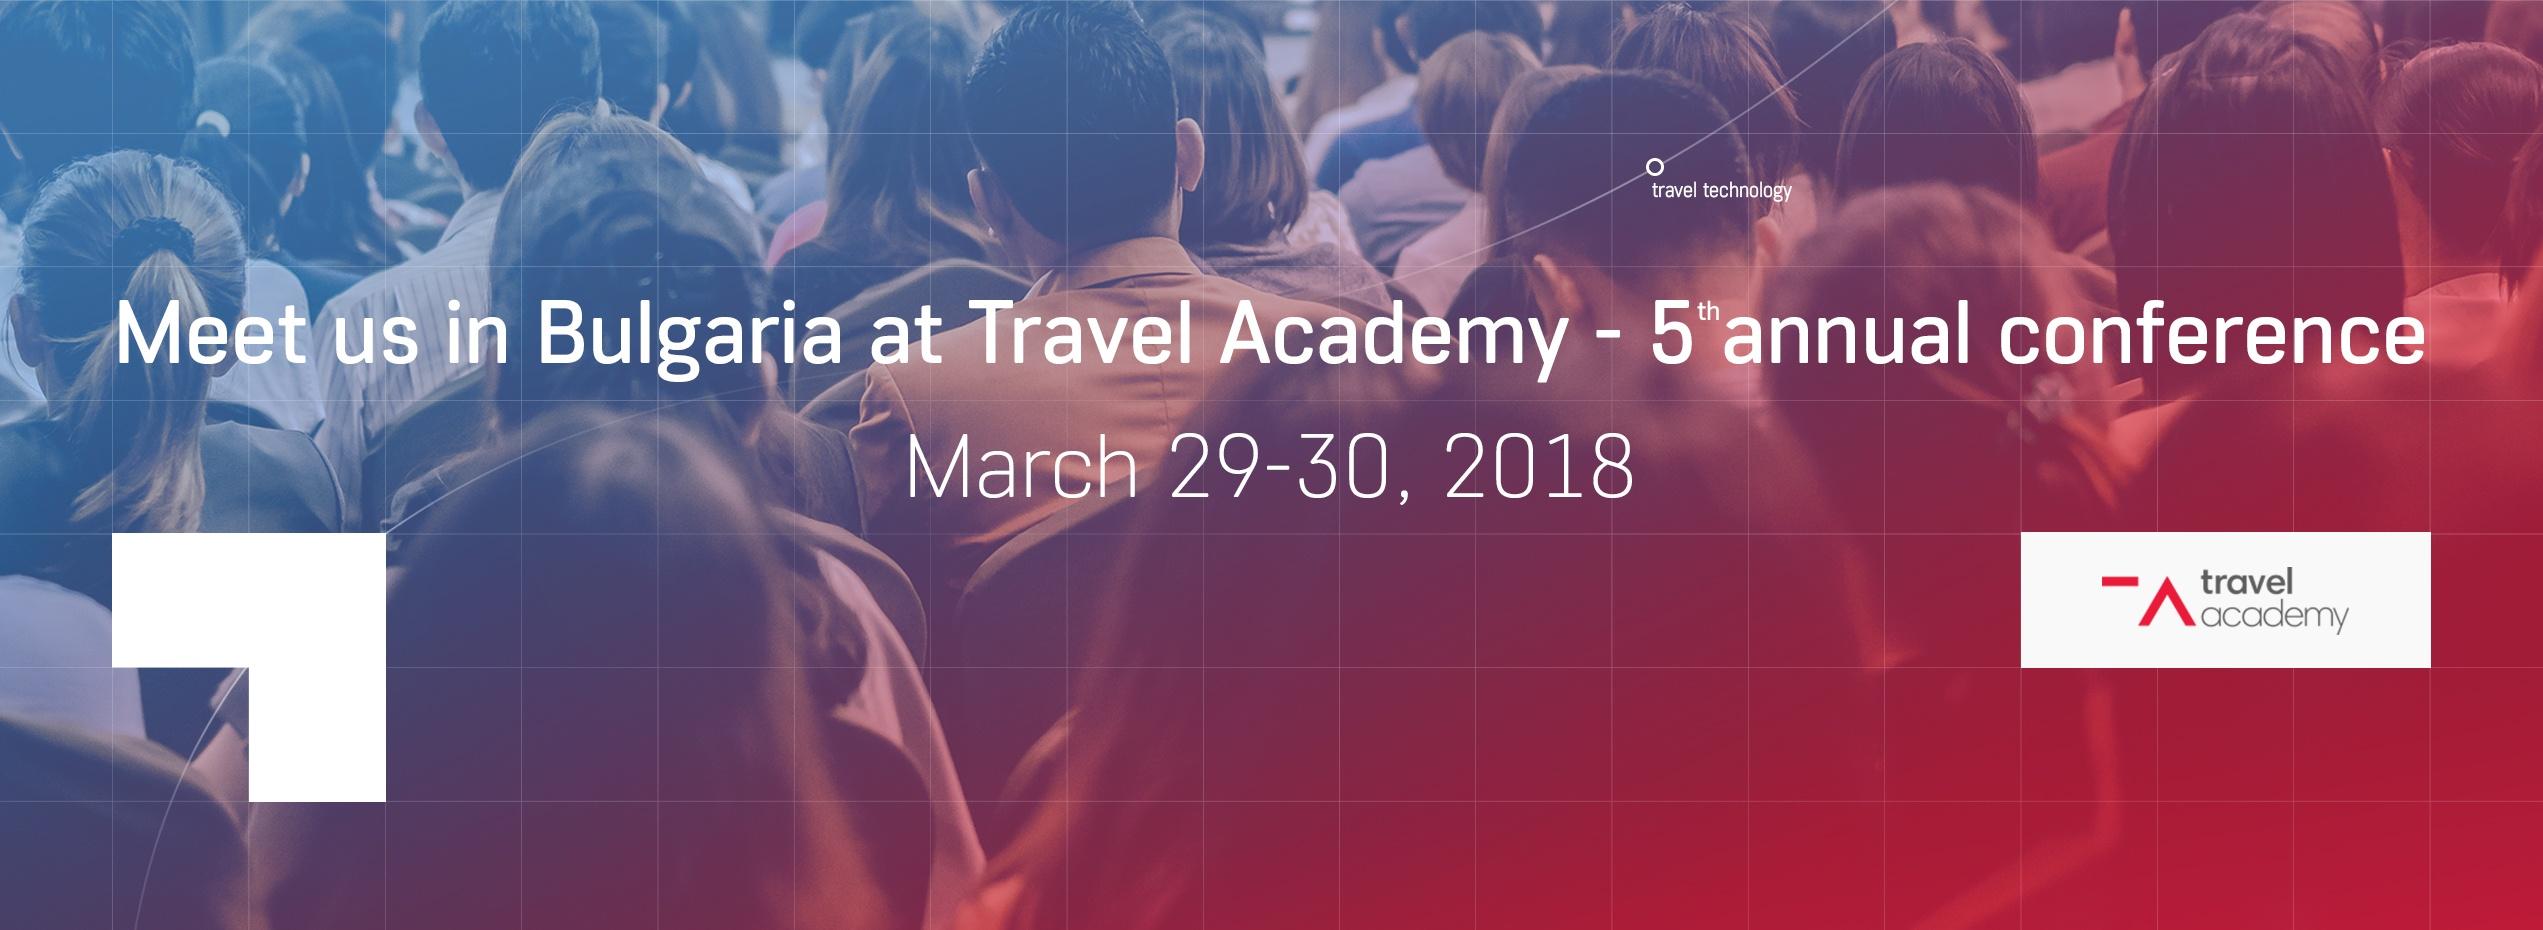 Travel Academy Bulgaria